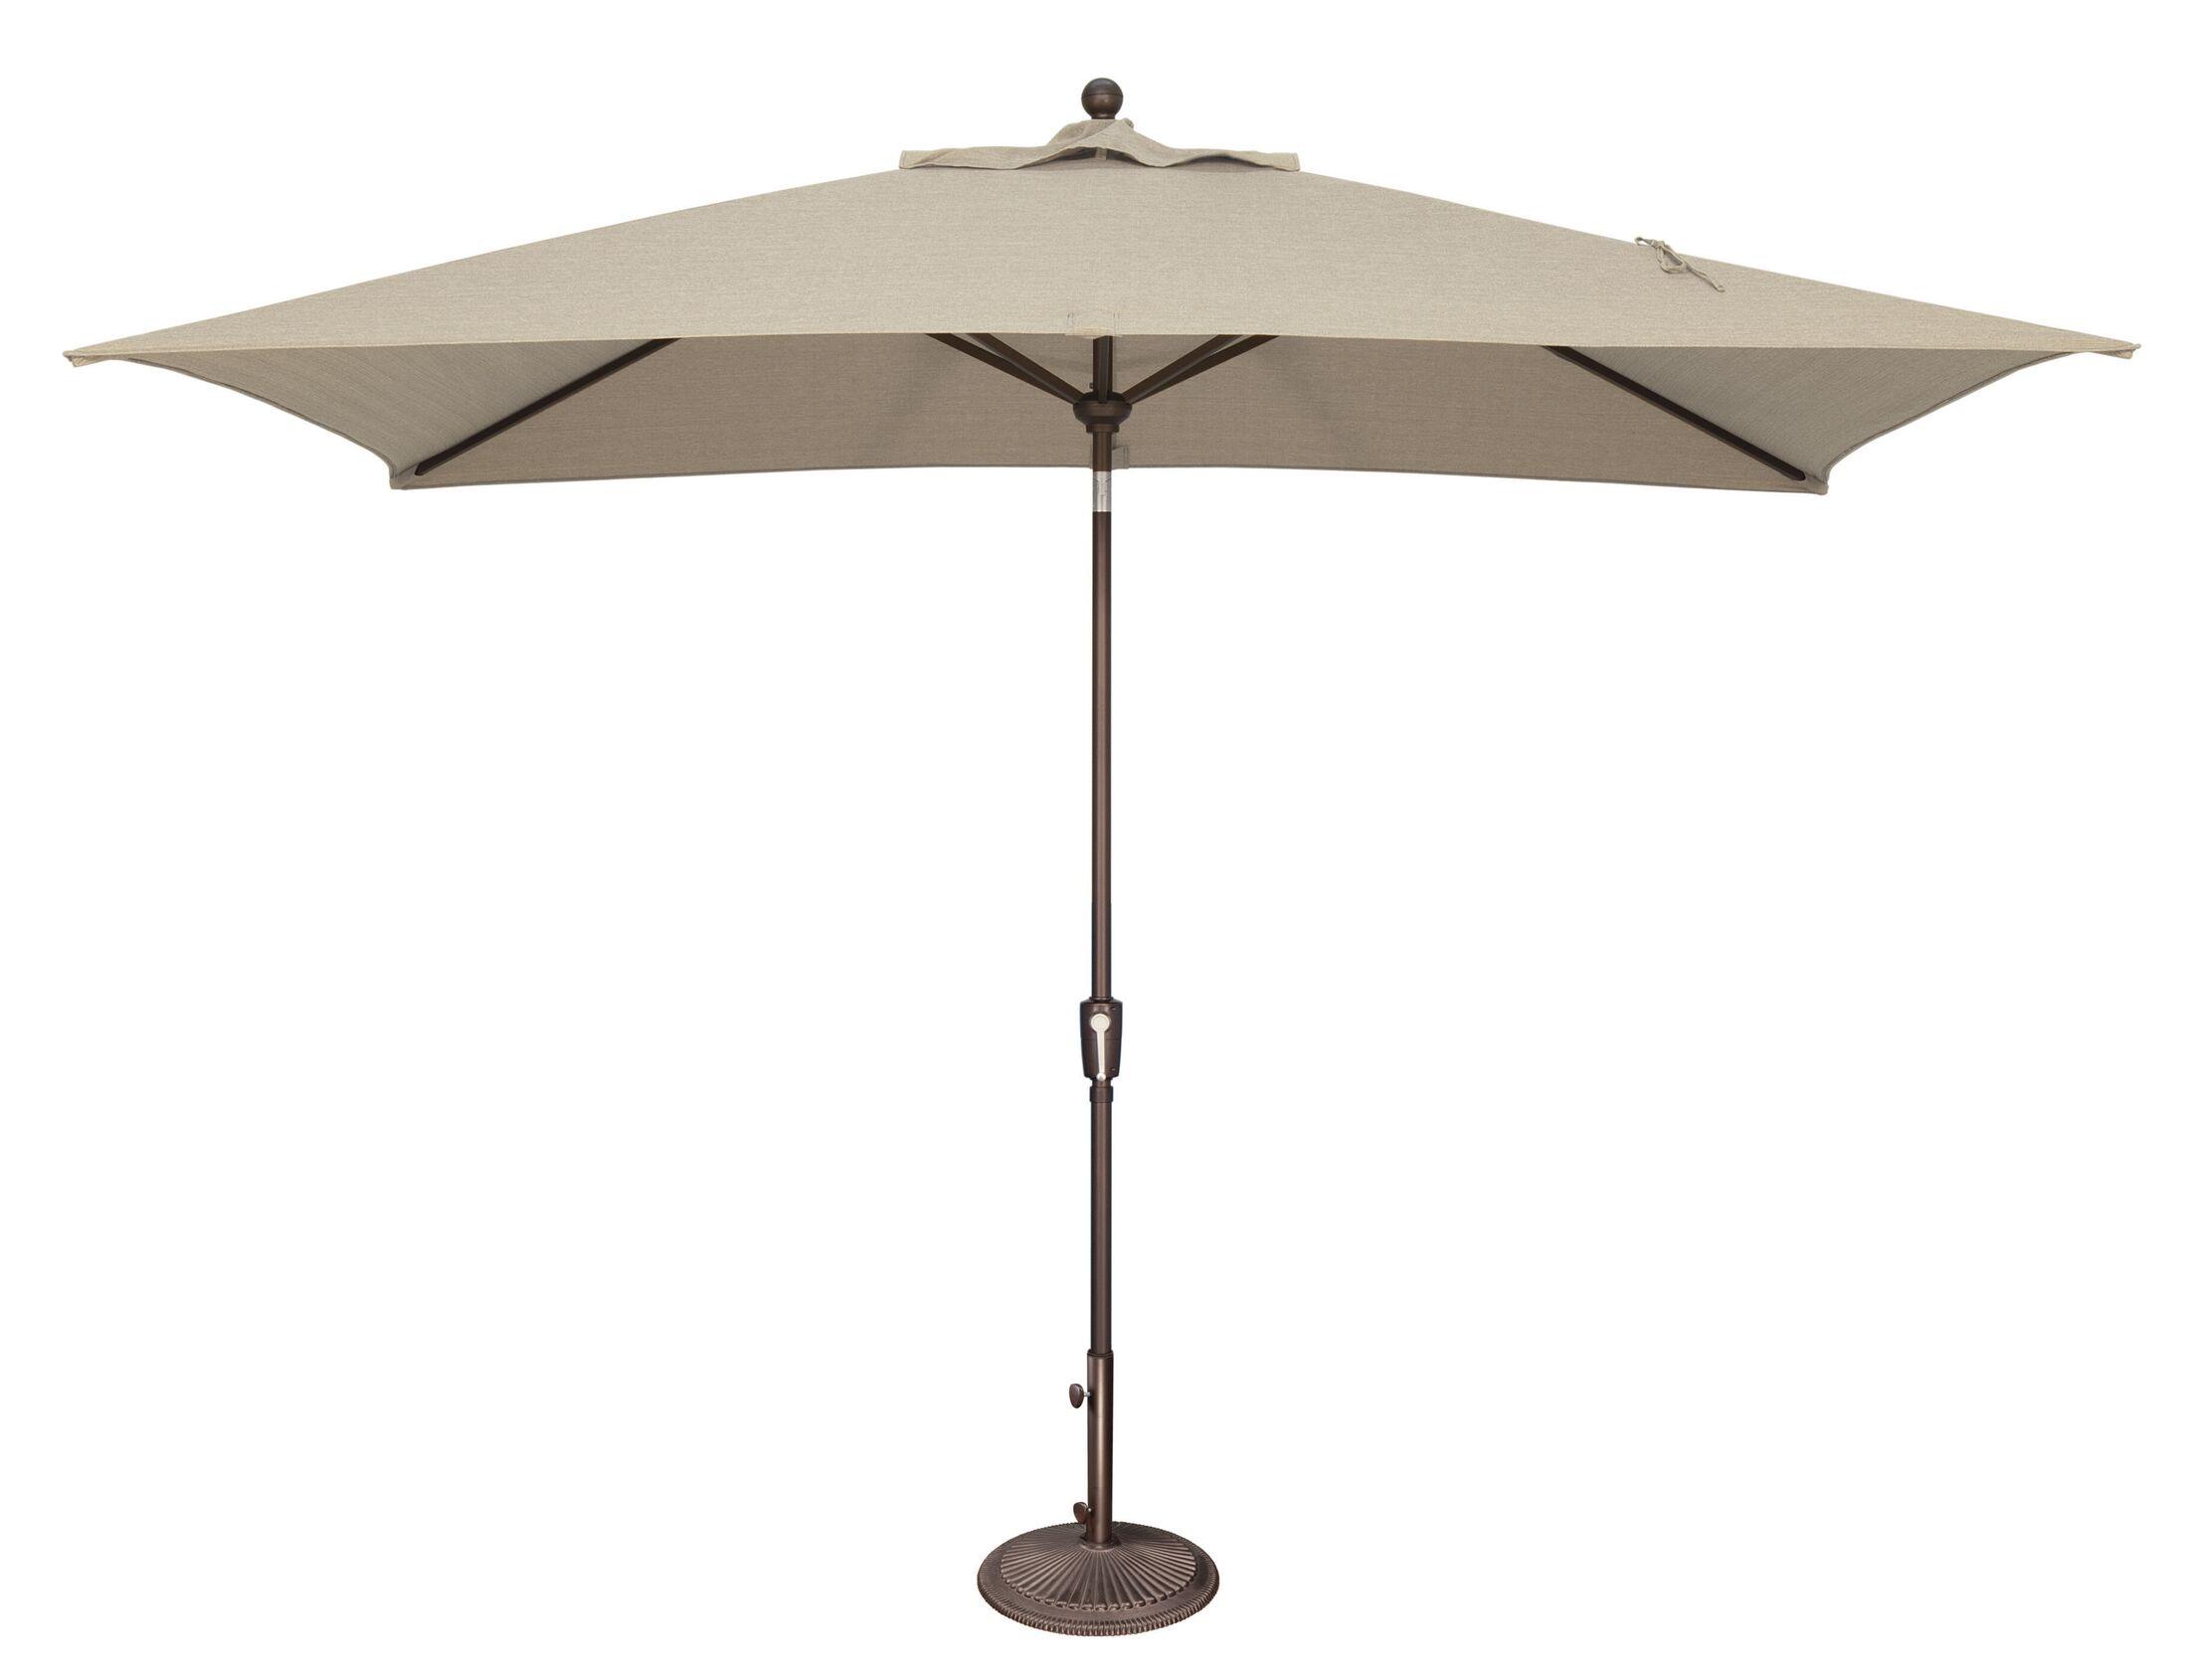 Catalina 10' X 6.5' Rectangular Market Umbrella Fabric Color: Solefin / Beige